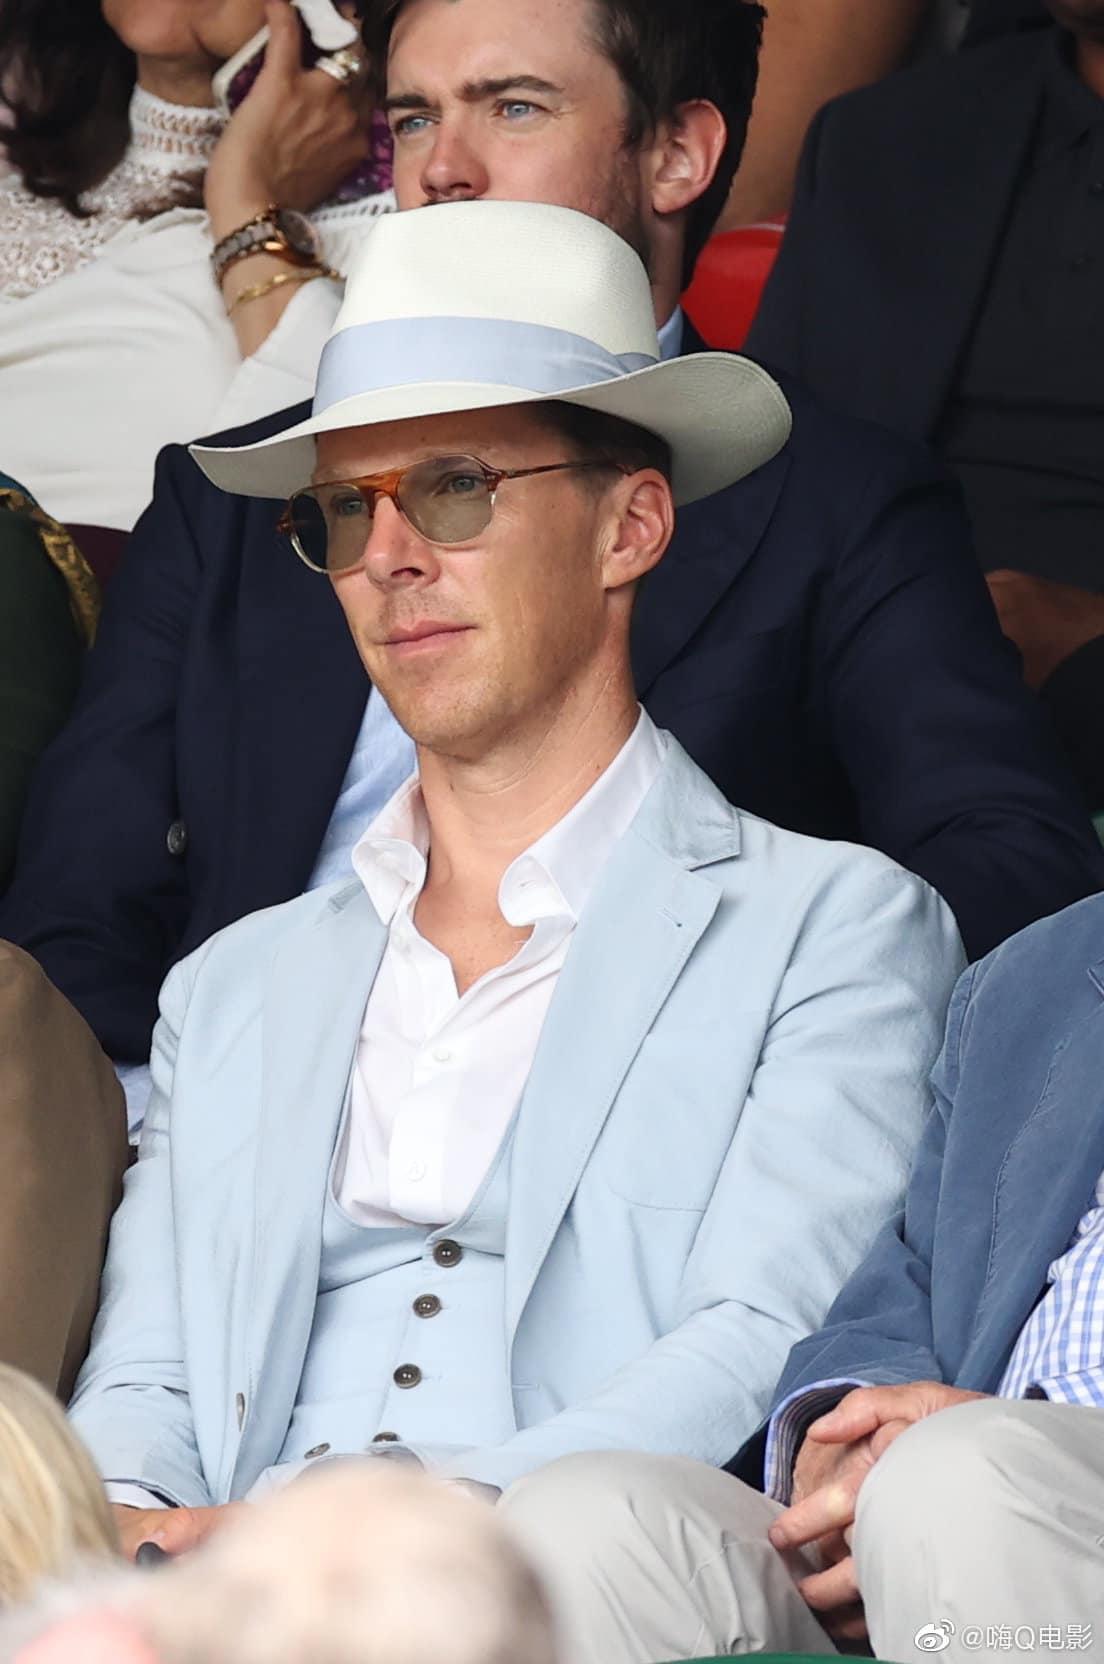 thời trang Benedict-Cumberbatch tại Wimbledon